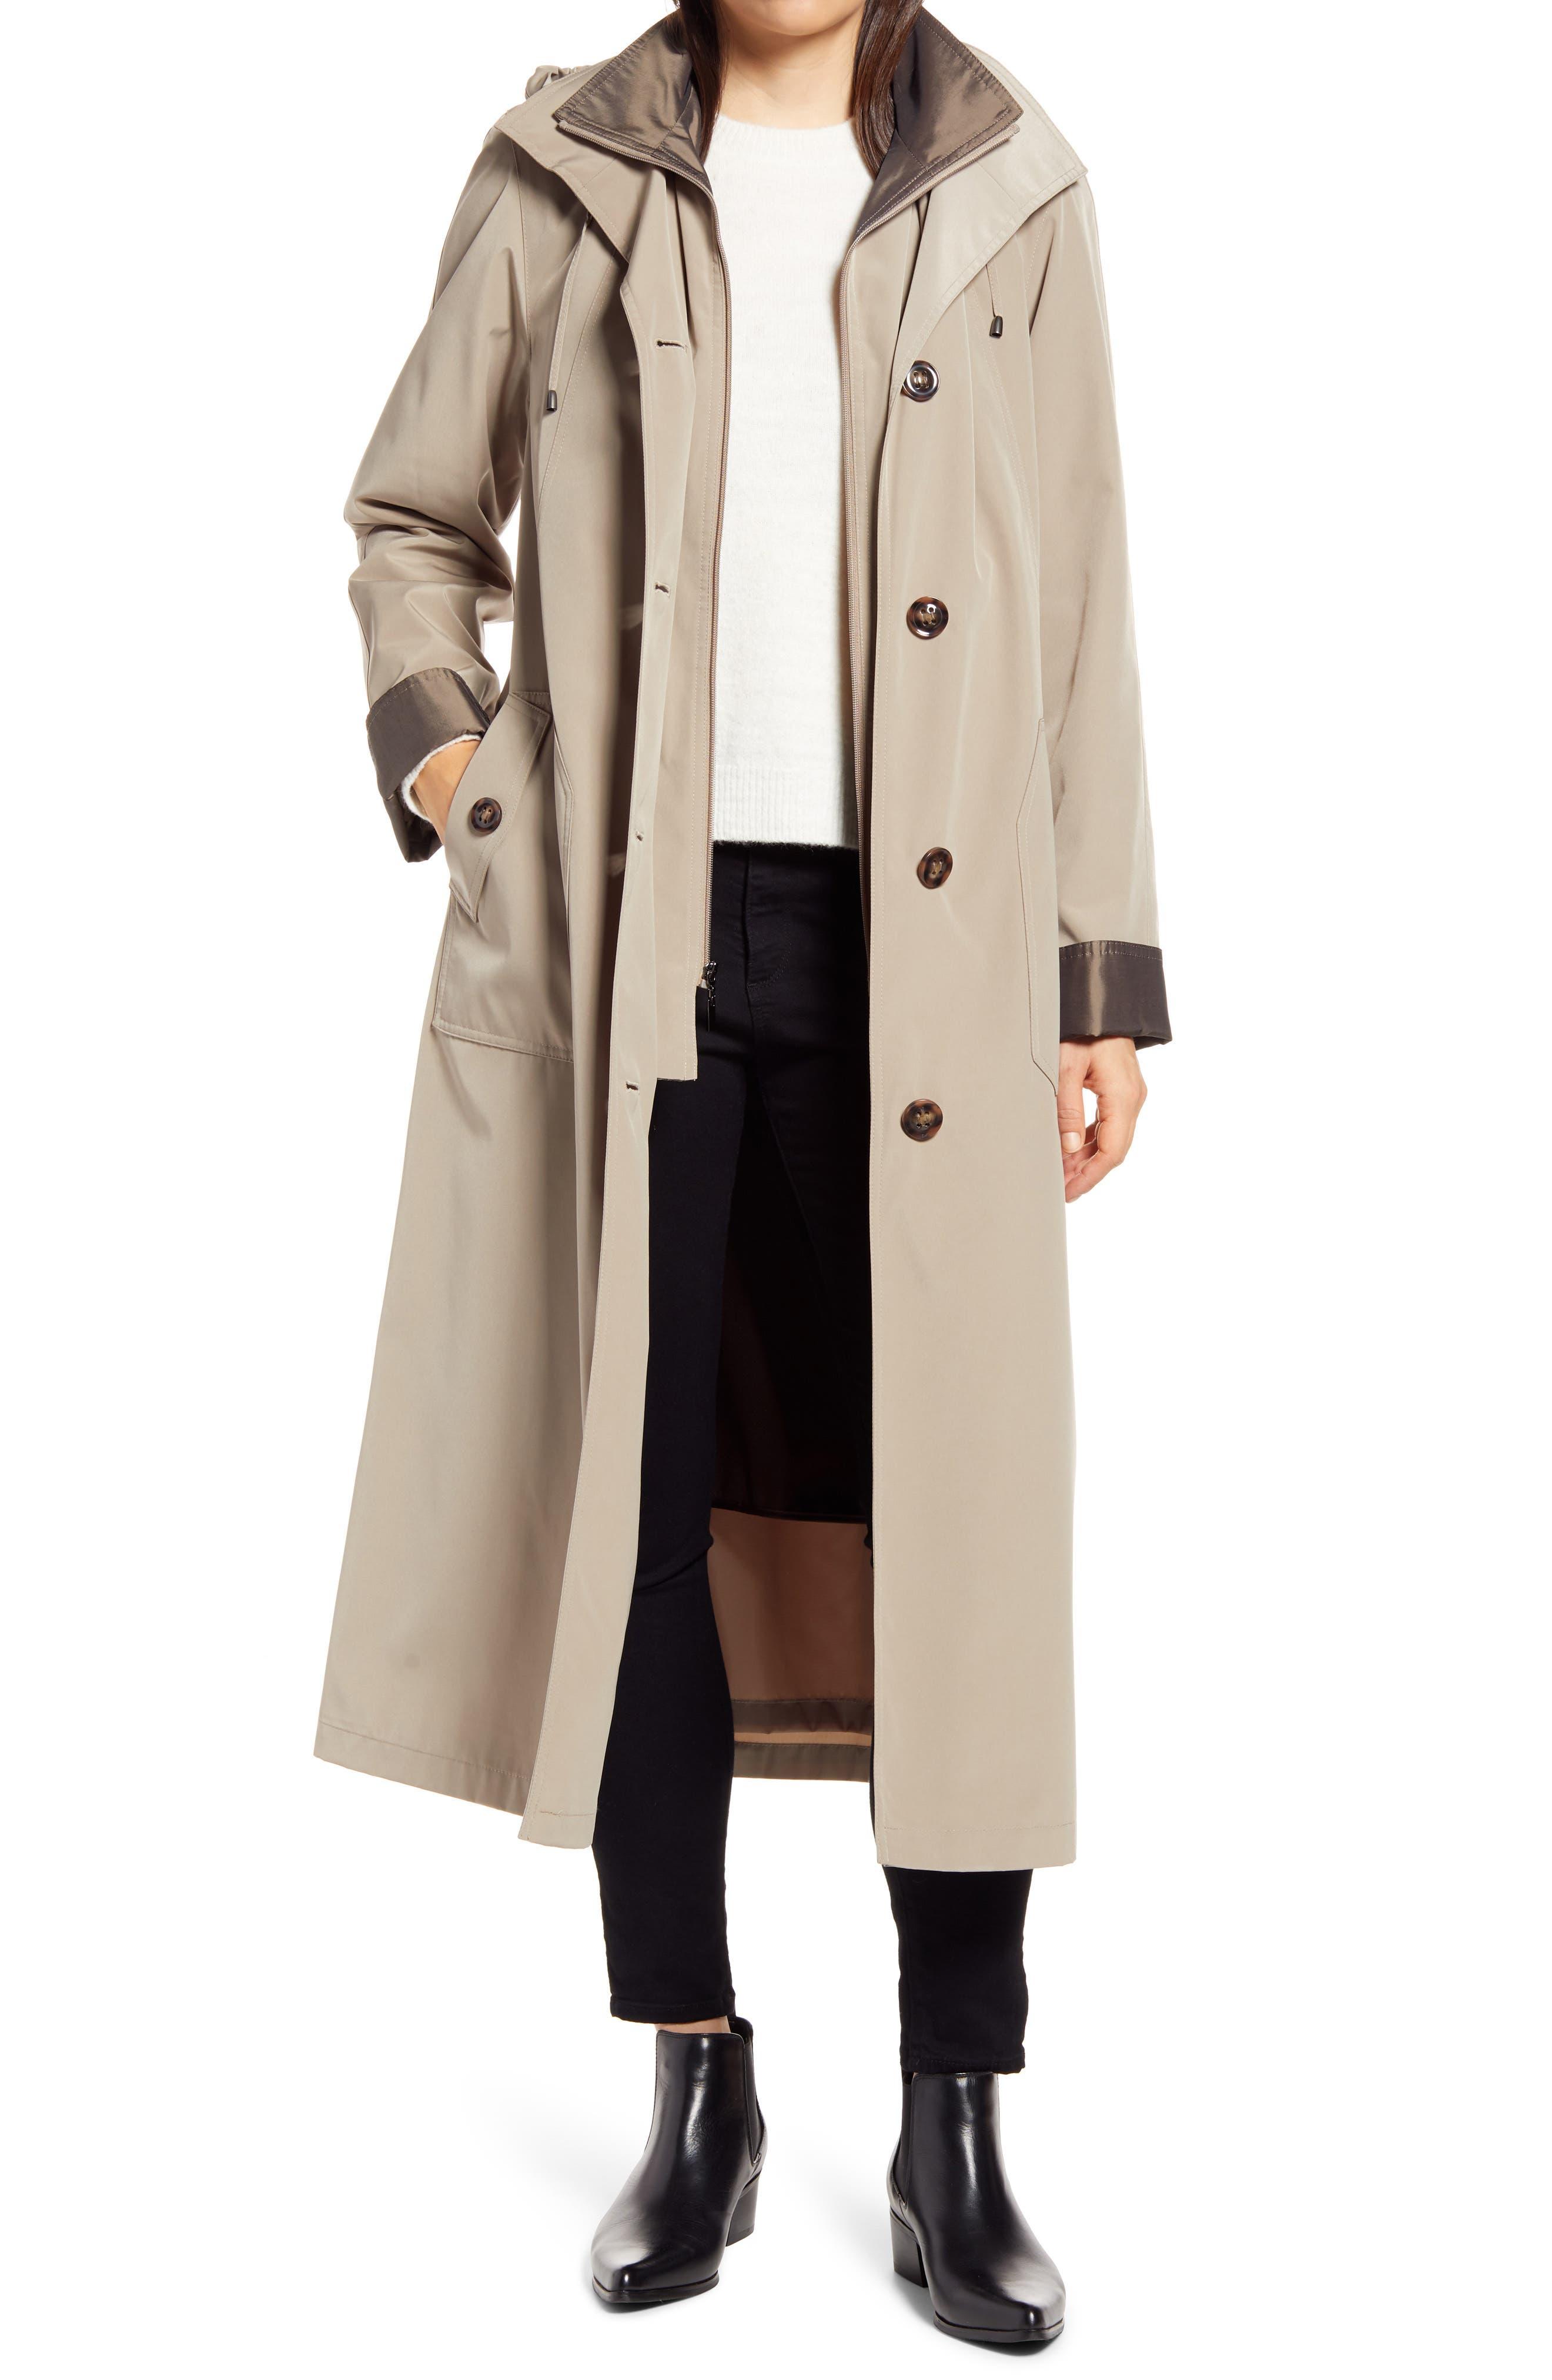 Full Length Two-Tone Silk Look Raincoat